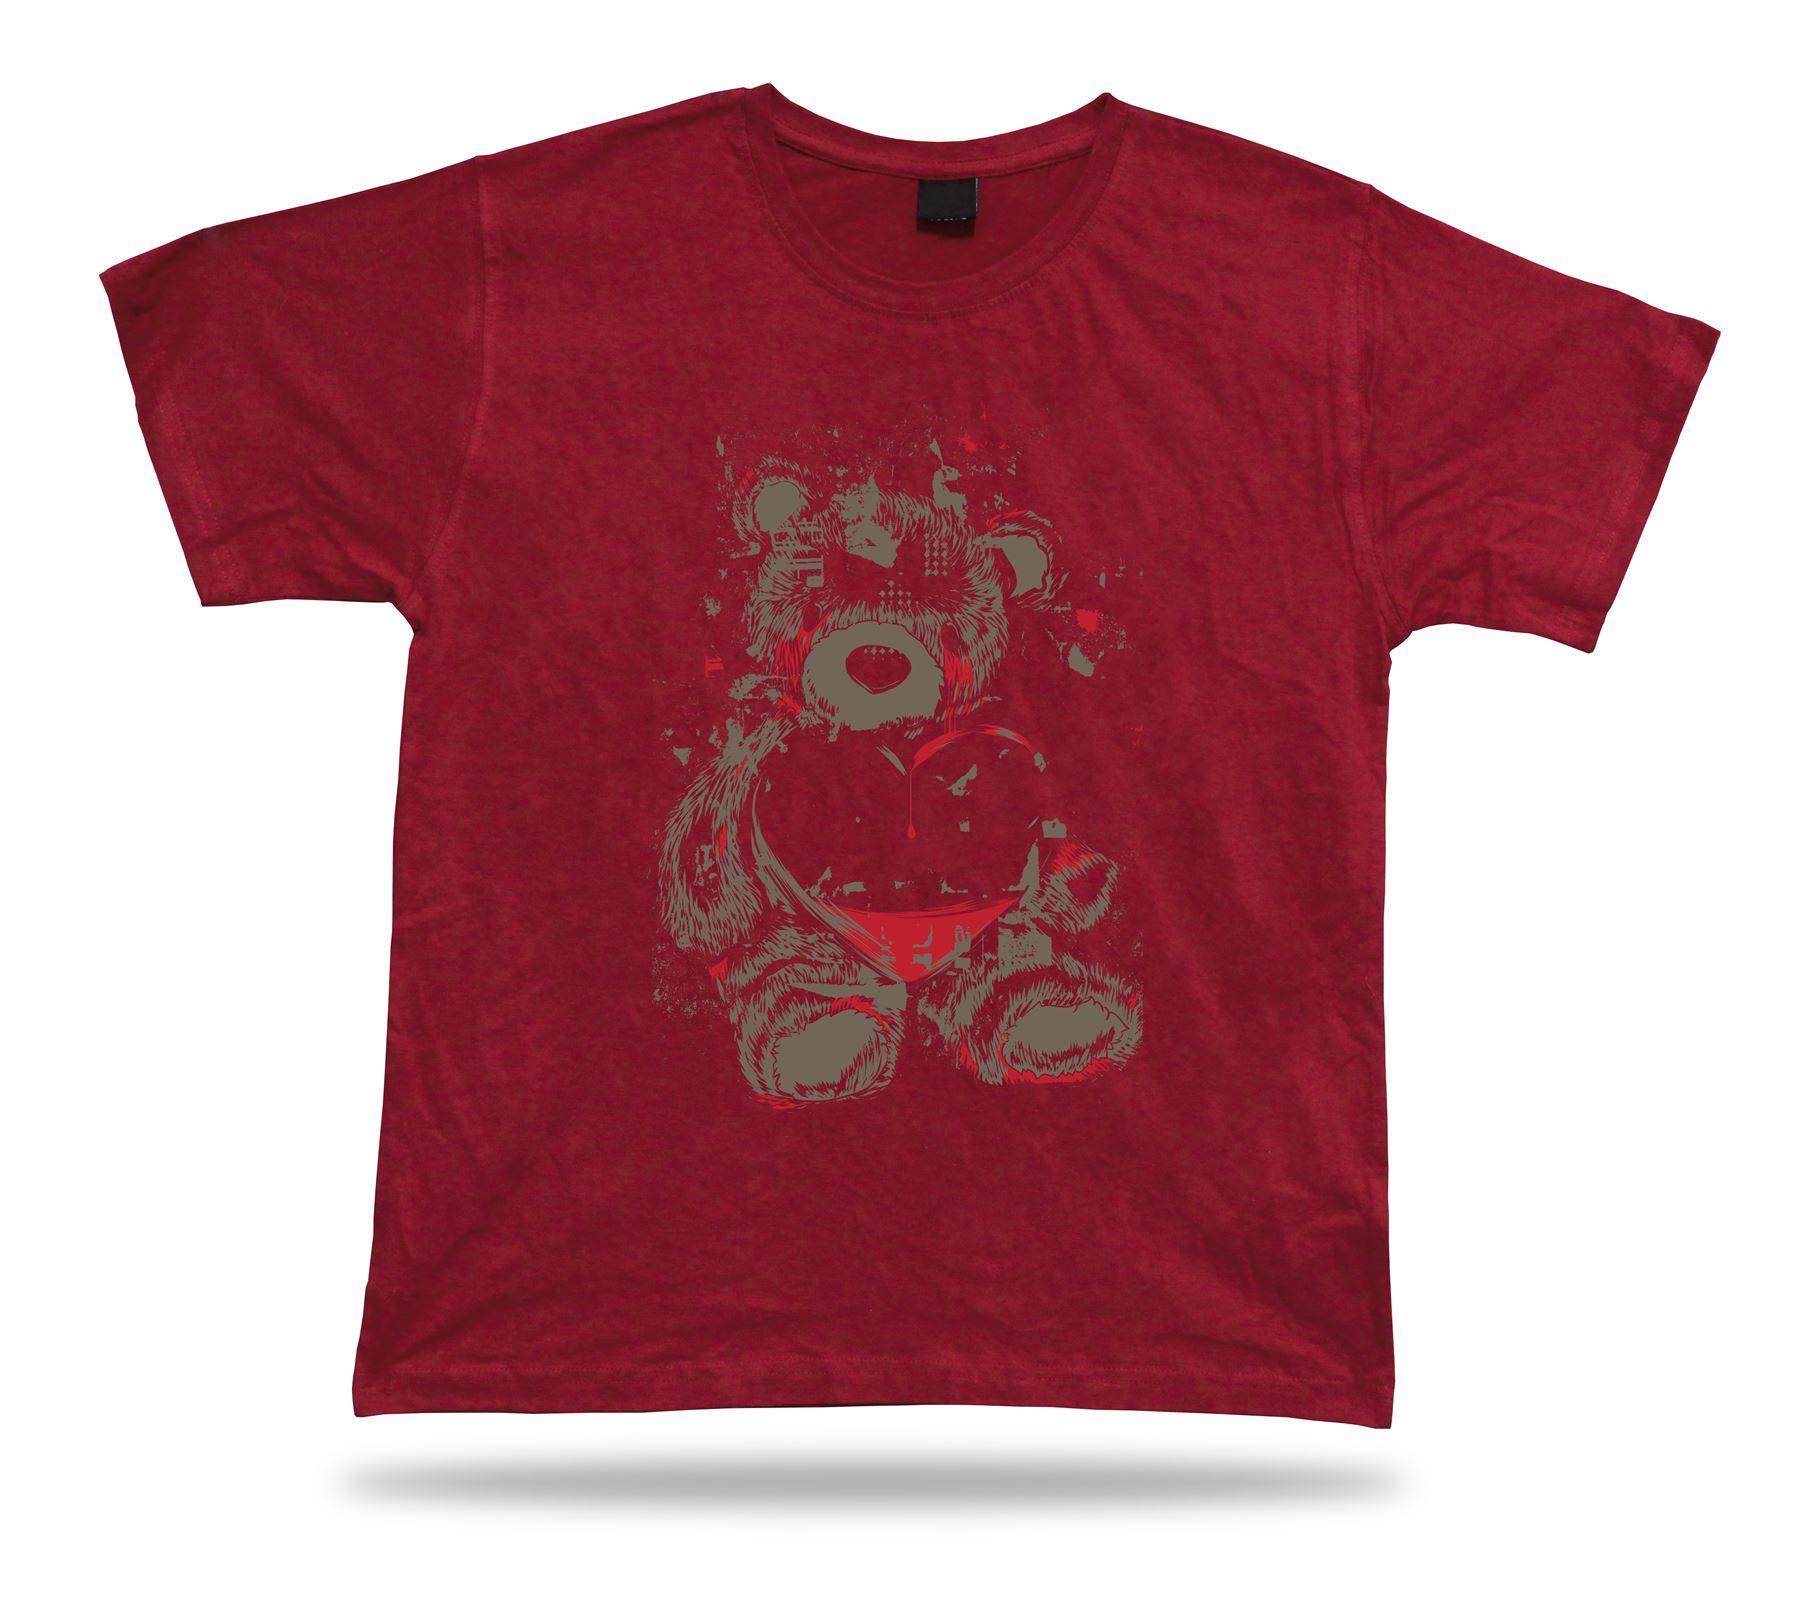 89a7eb548cbb Teddy Bear Crying Heart Love Care stylish Tshirt tee shirt vector ...